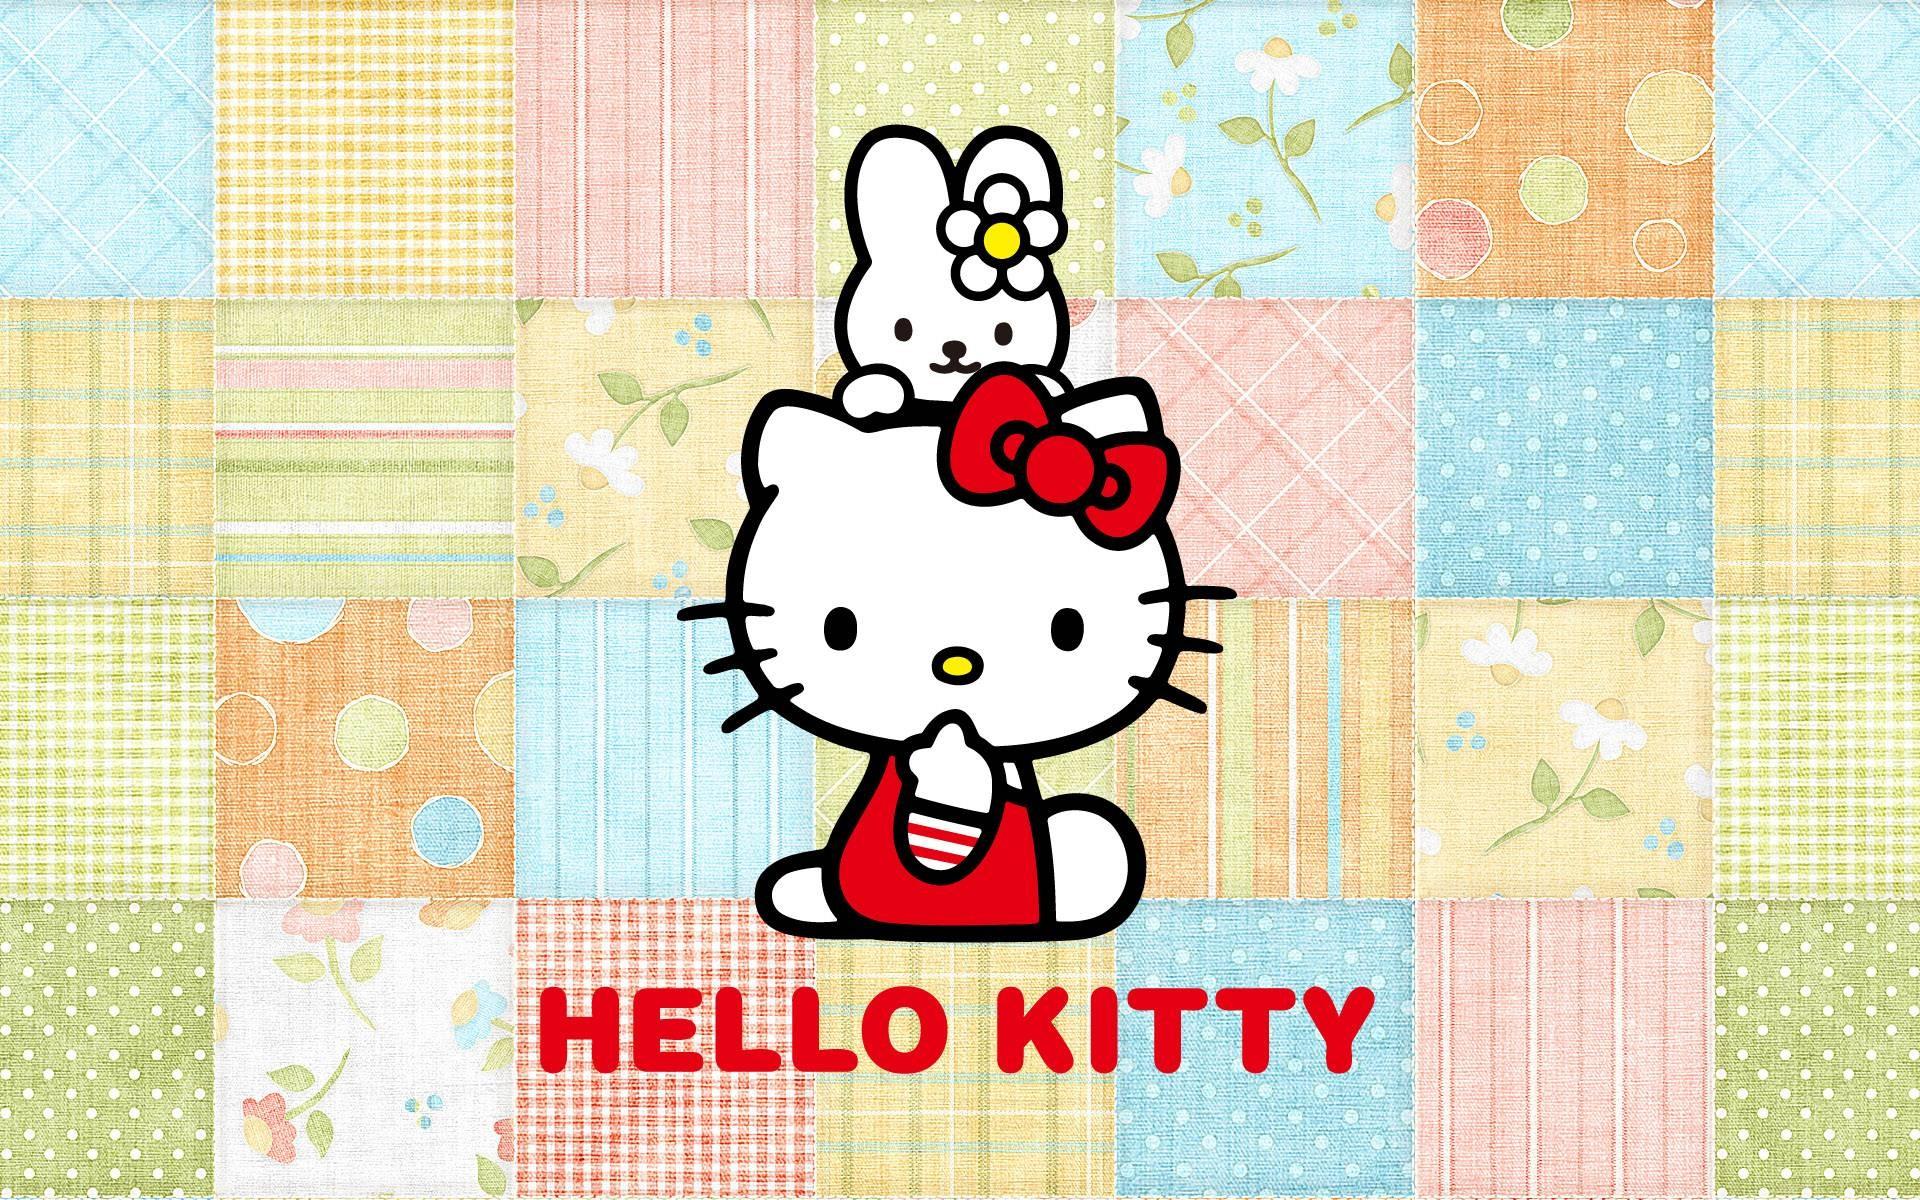 Best Wallpaper Hello Kitty Mint Green - 132072-hello-kitty-background-1920x1200-htc  2018_8626100.jpg